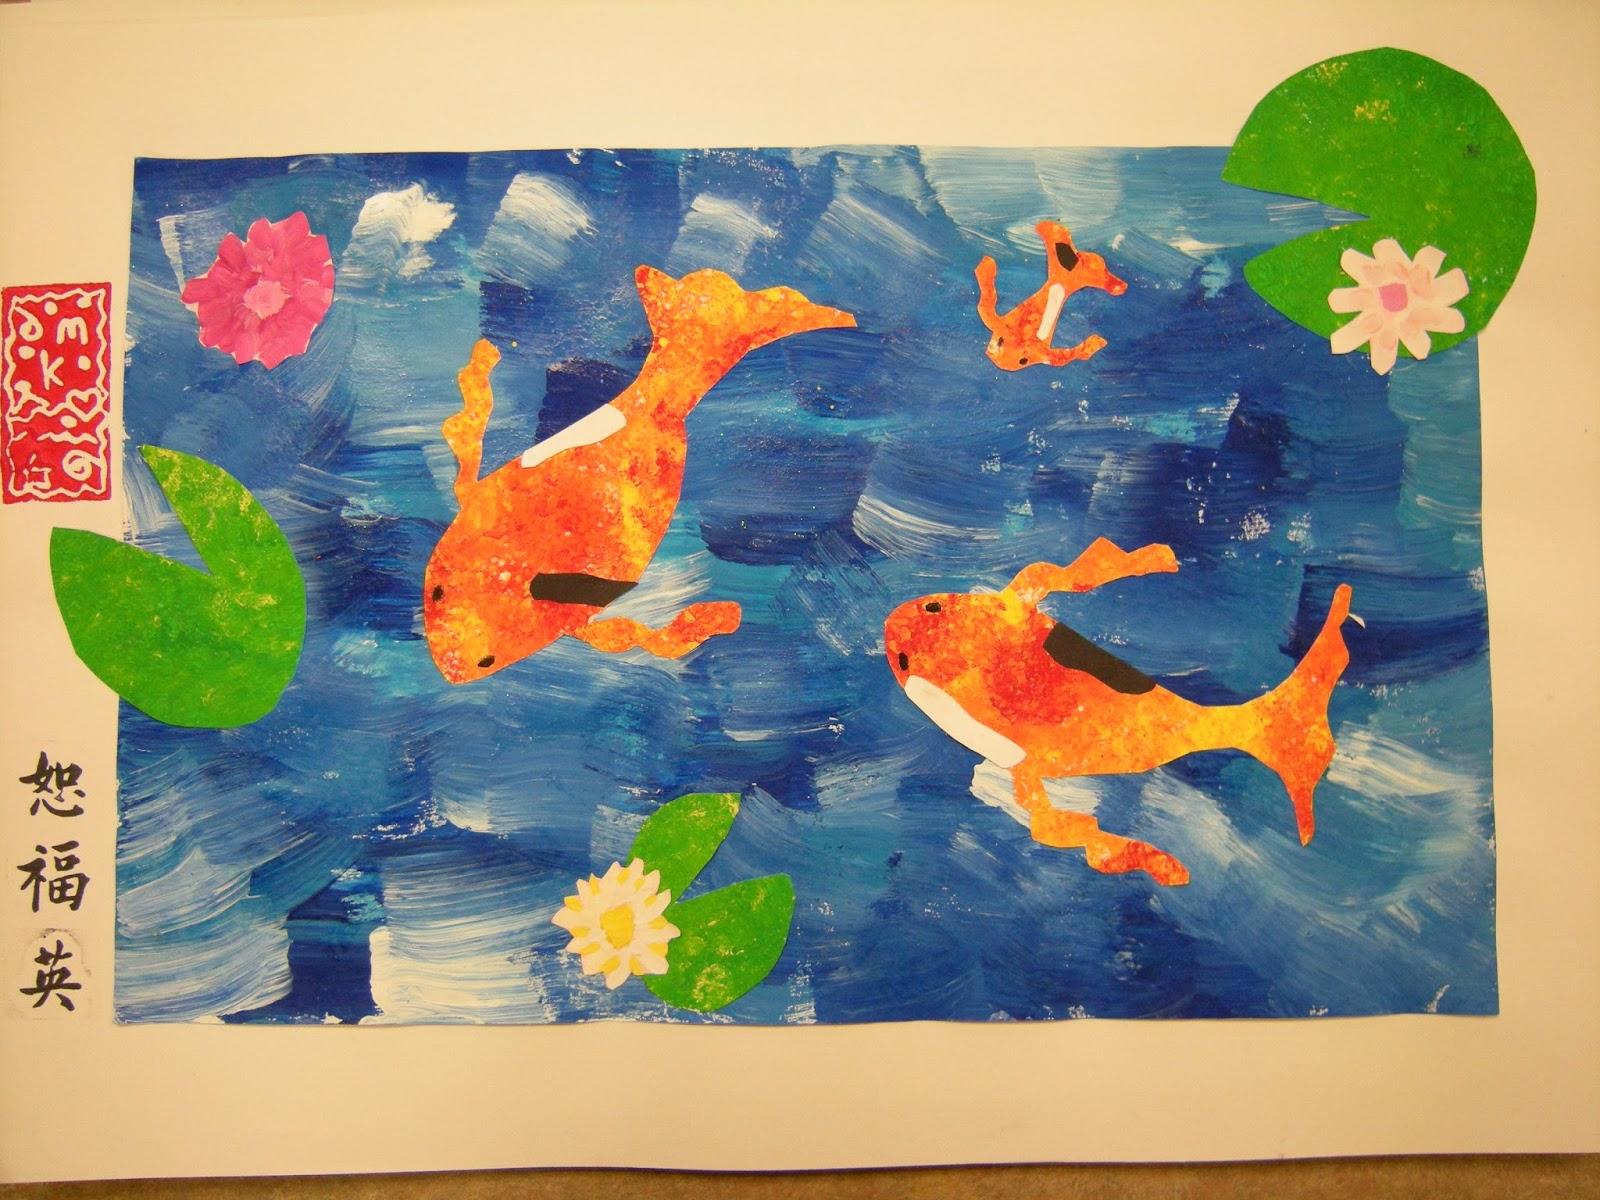 Artolazzi Koi Fish Collage